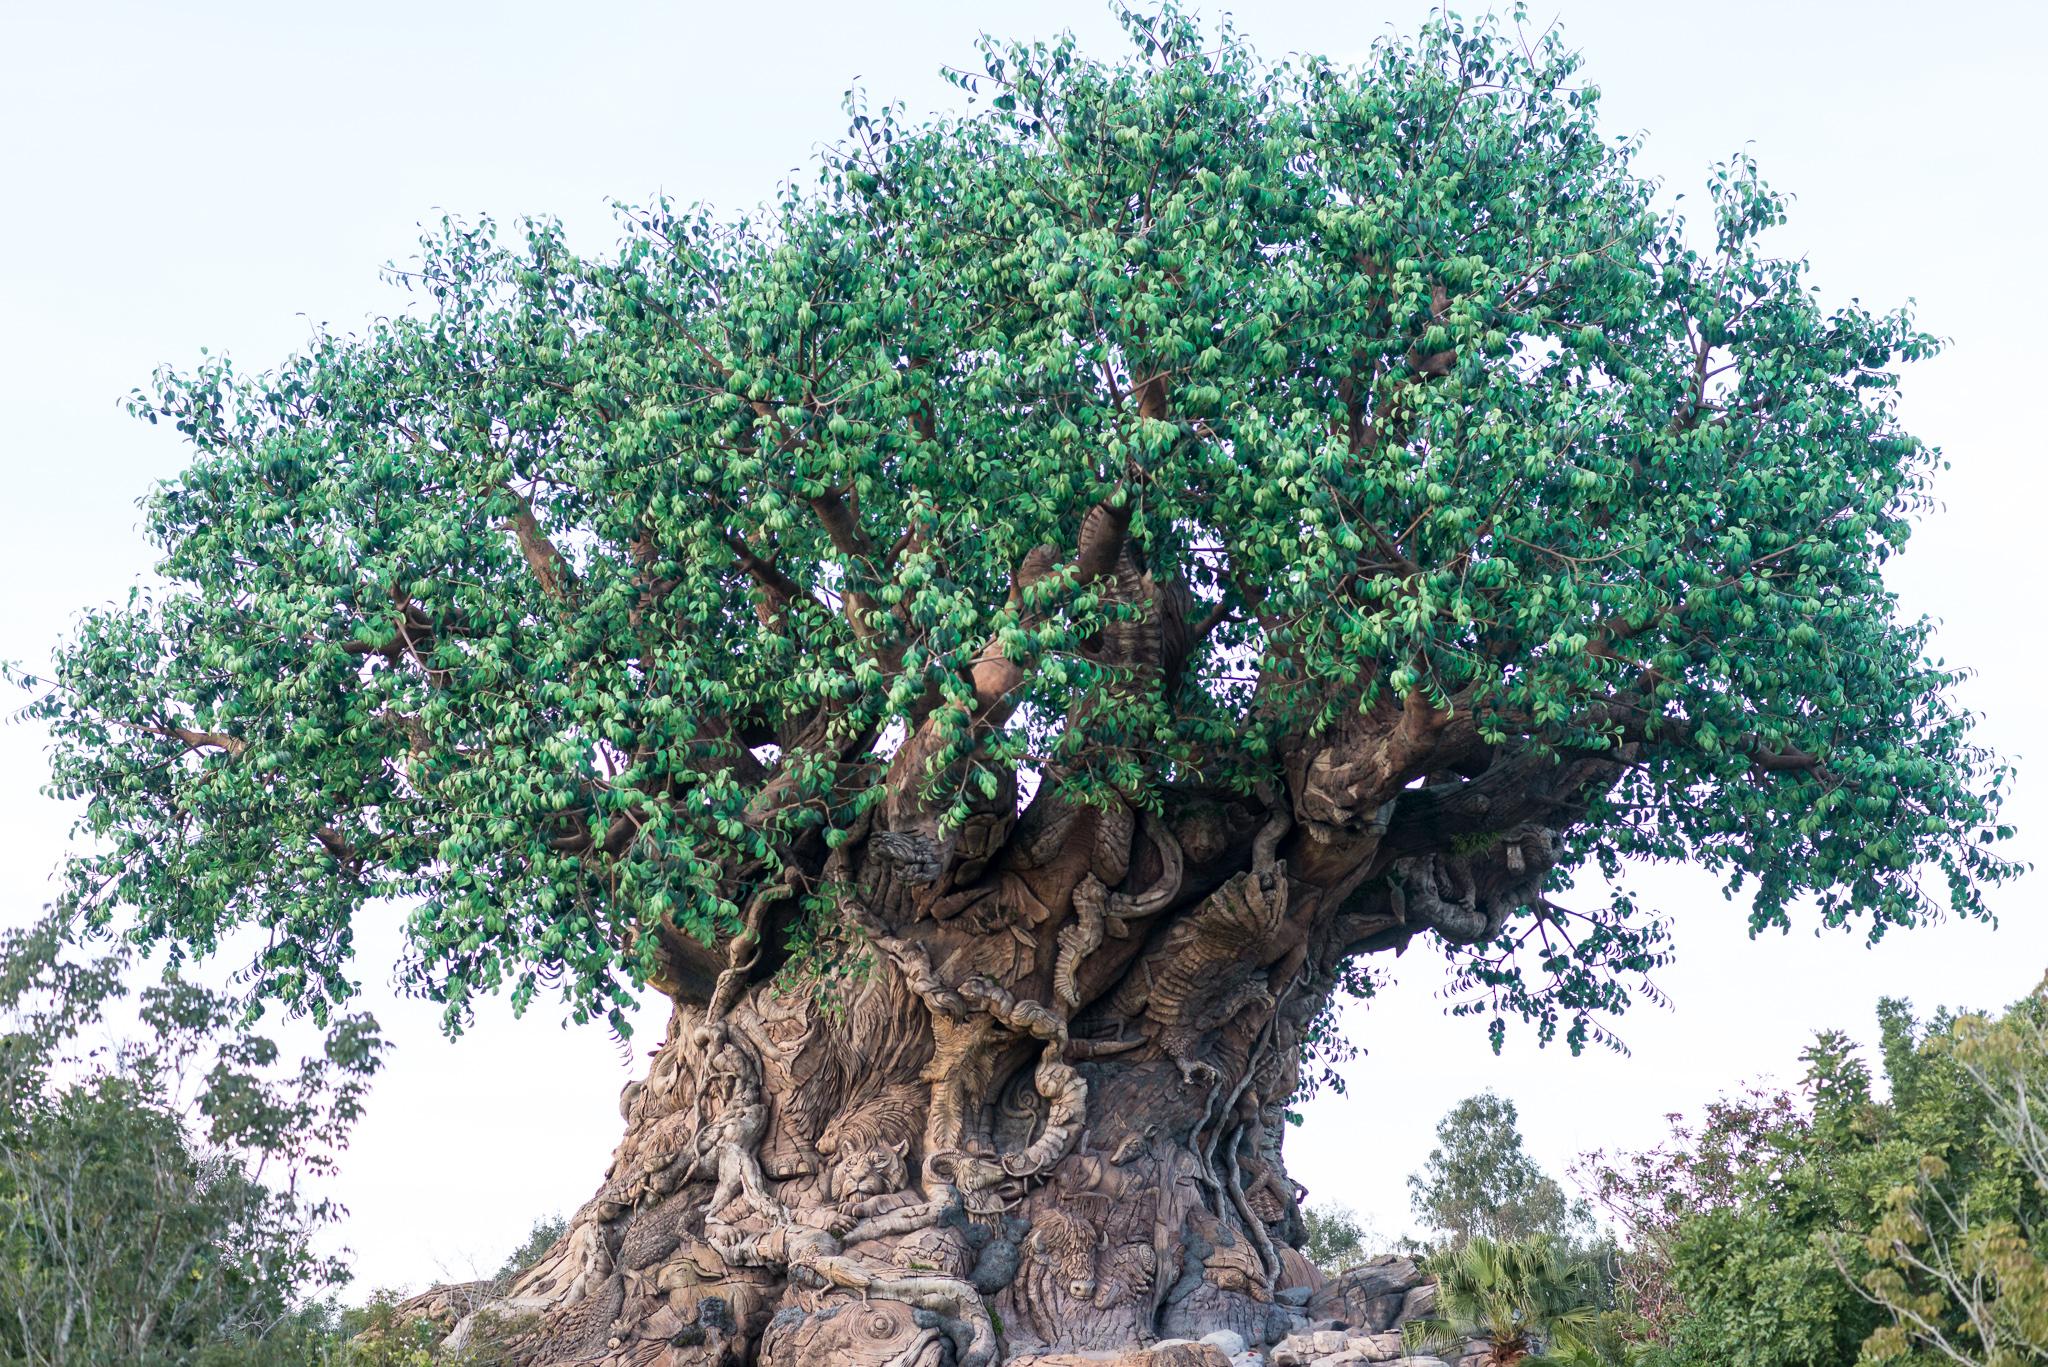 Tree of Life - Disney's Animal Kingdom